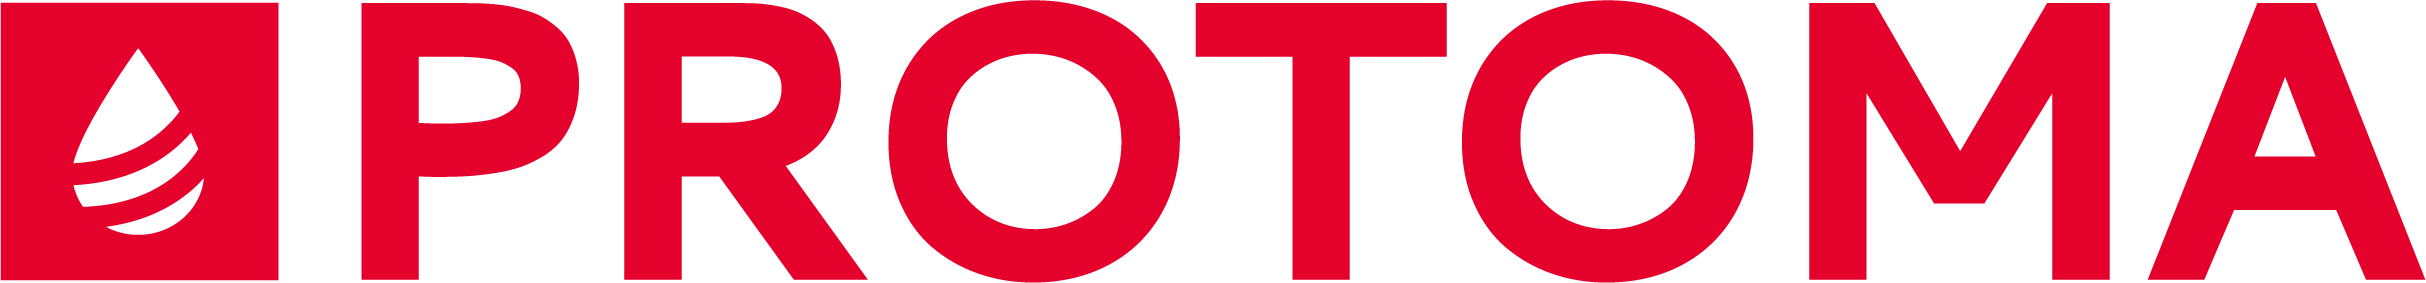 Protoma